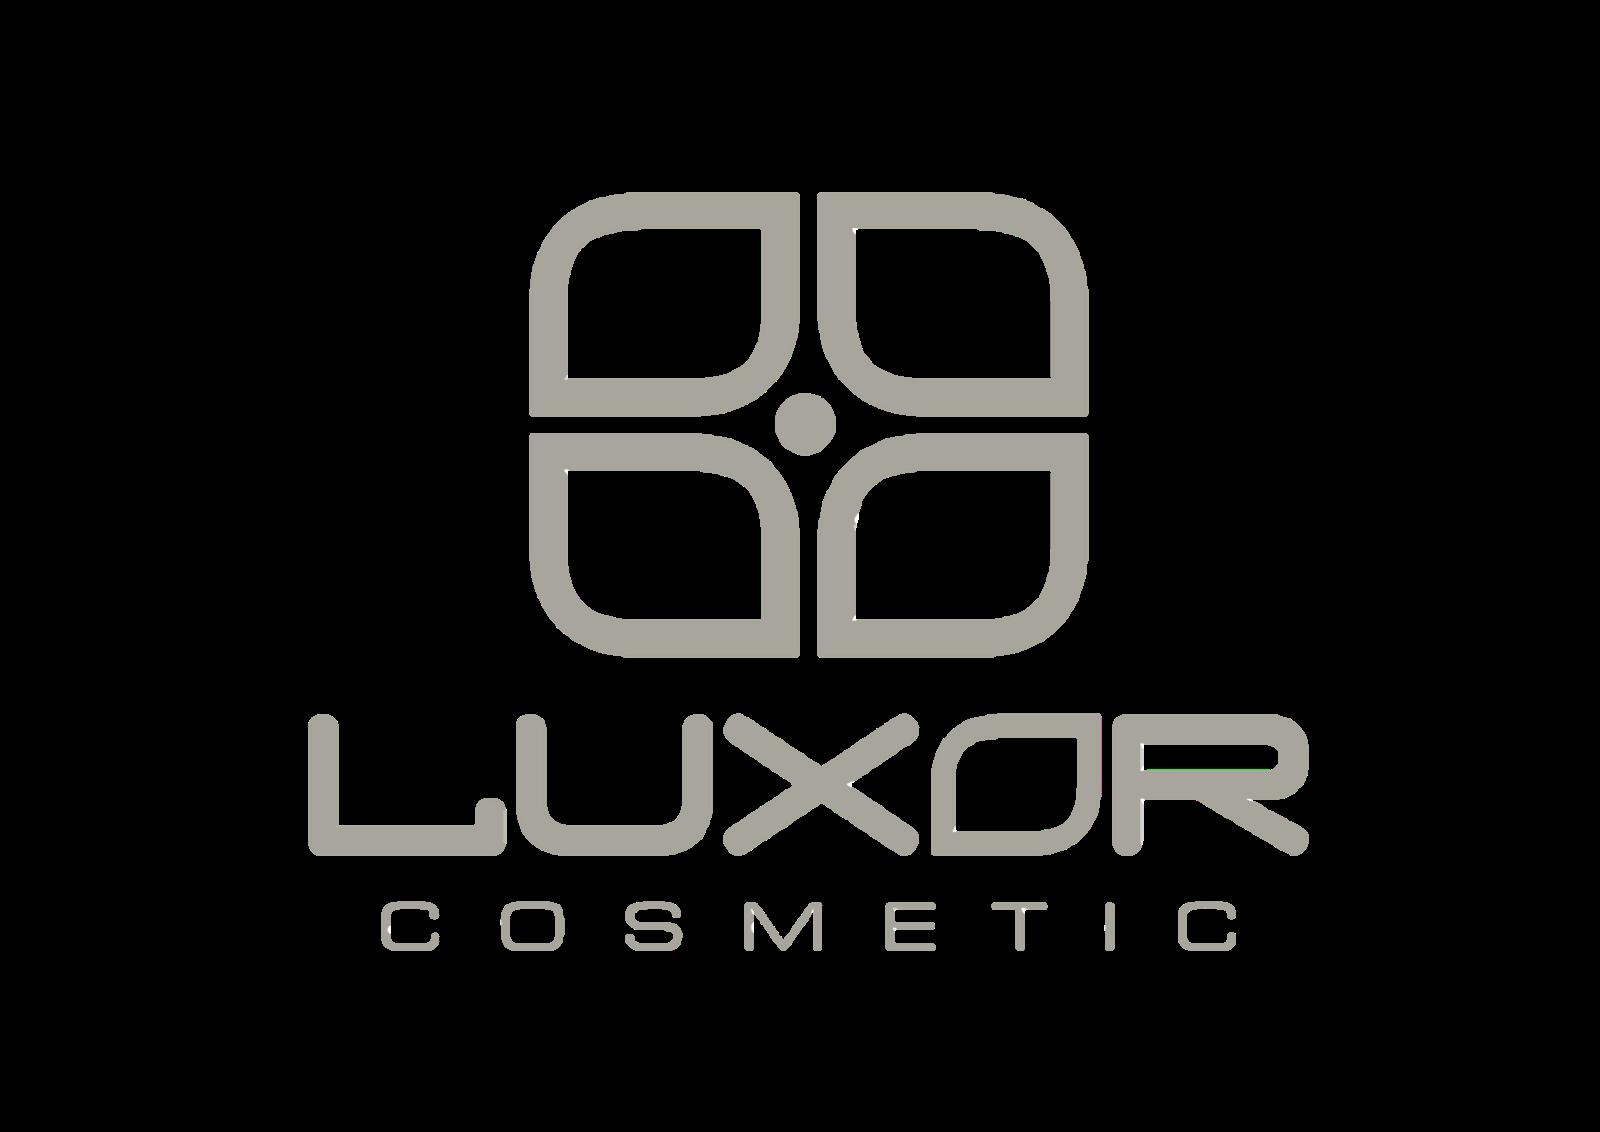 Luxor Cosmetic